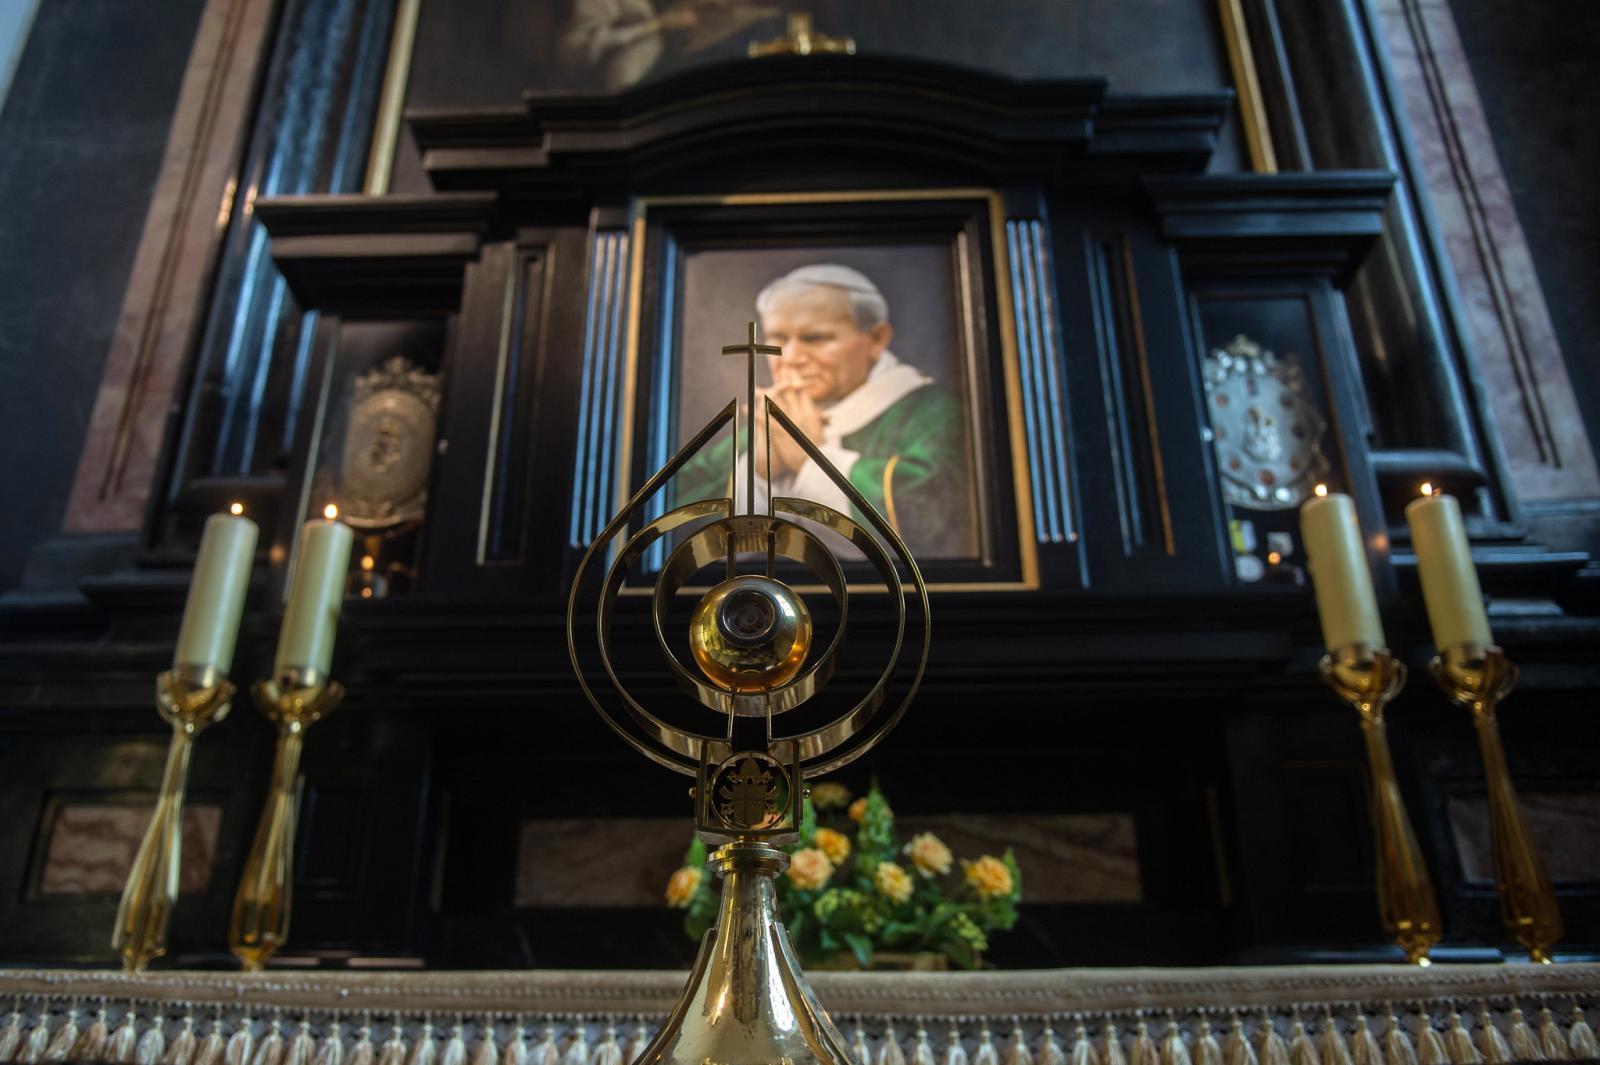 Novena to St John Paul II for the flourishing of life